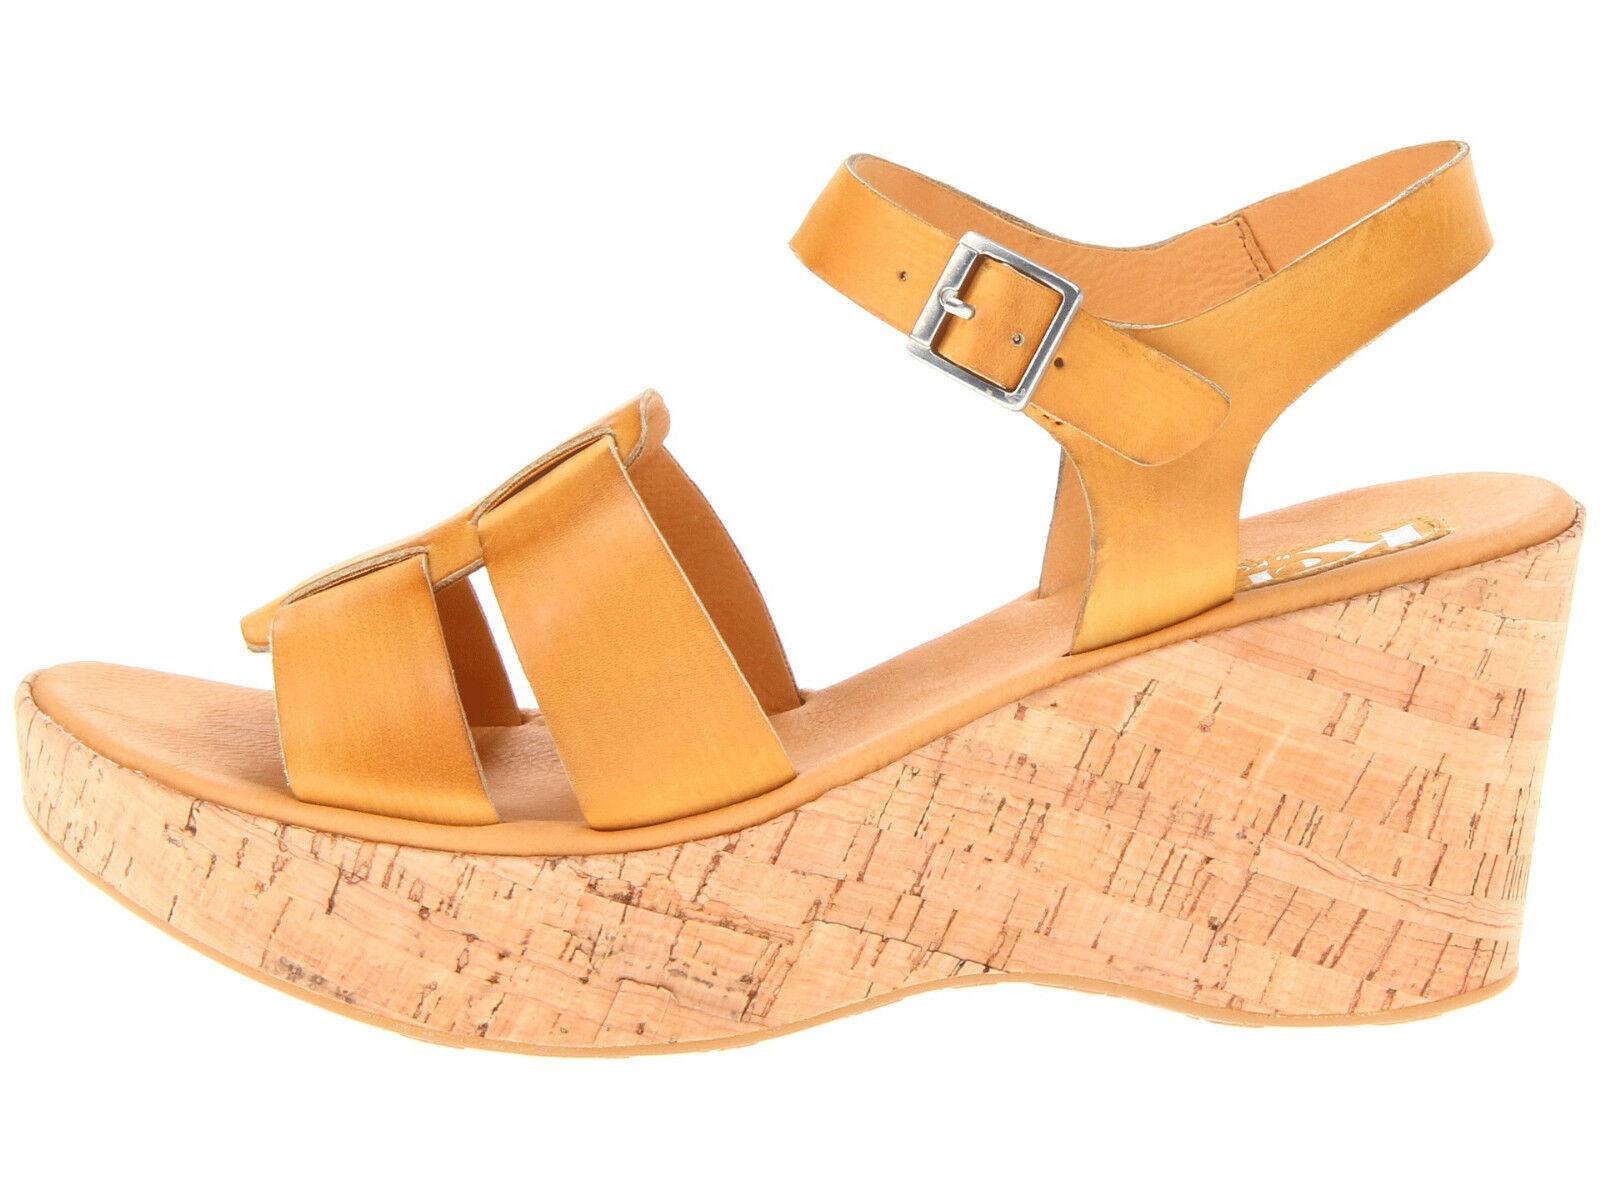 $99 NIB Korks by Kork-Ease Brie Dark Yellow Leather Cork Wedge Comfy Shoe sz10MW